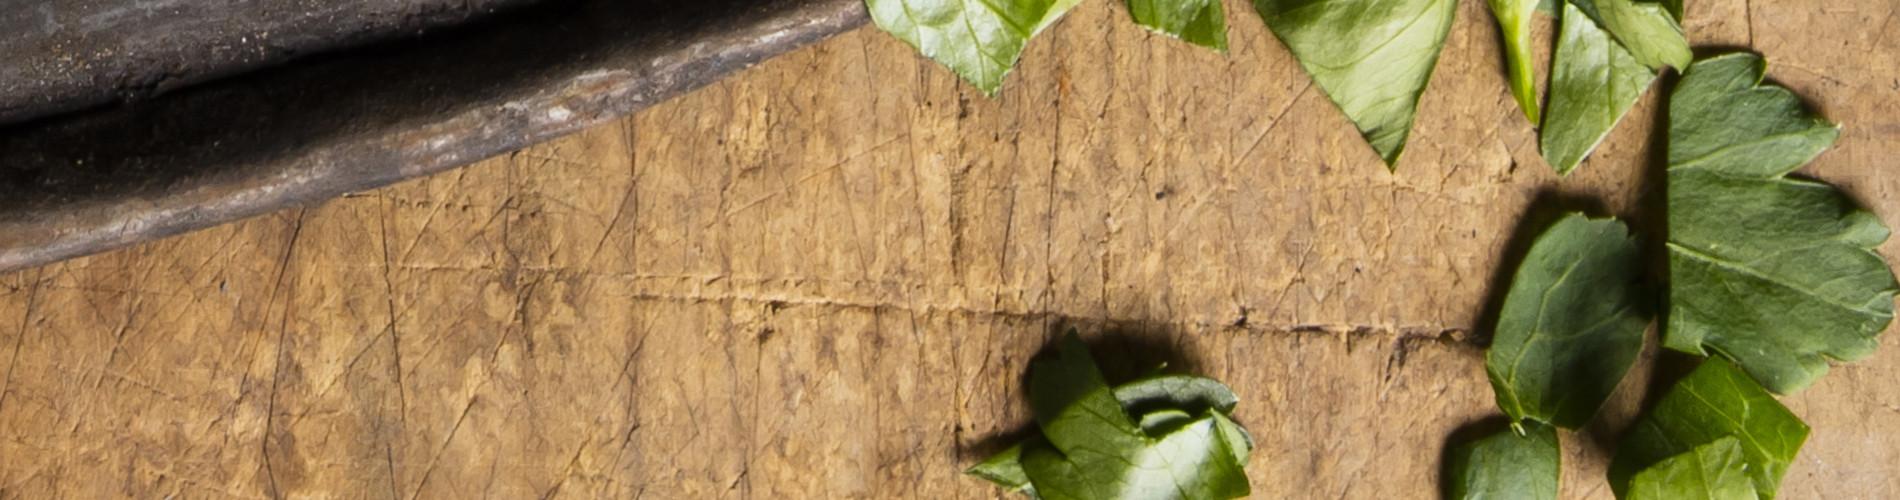 Bestecke PVD Titan & Kupfer